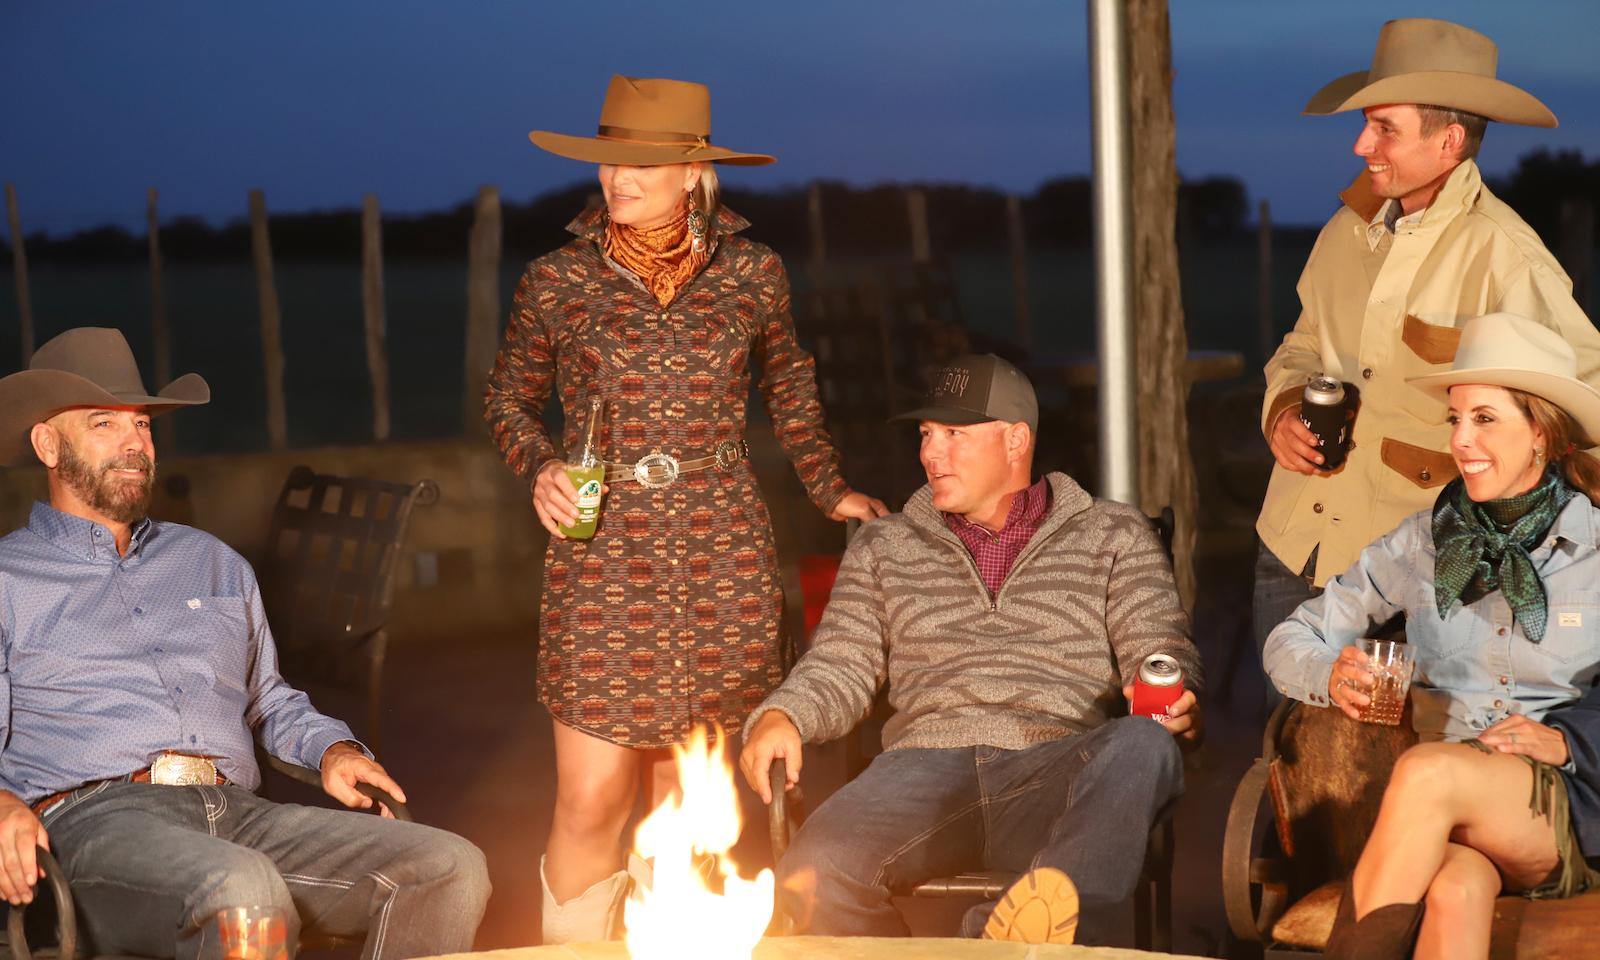 models in Western apparel